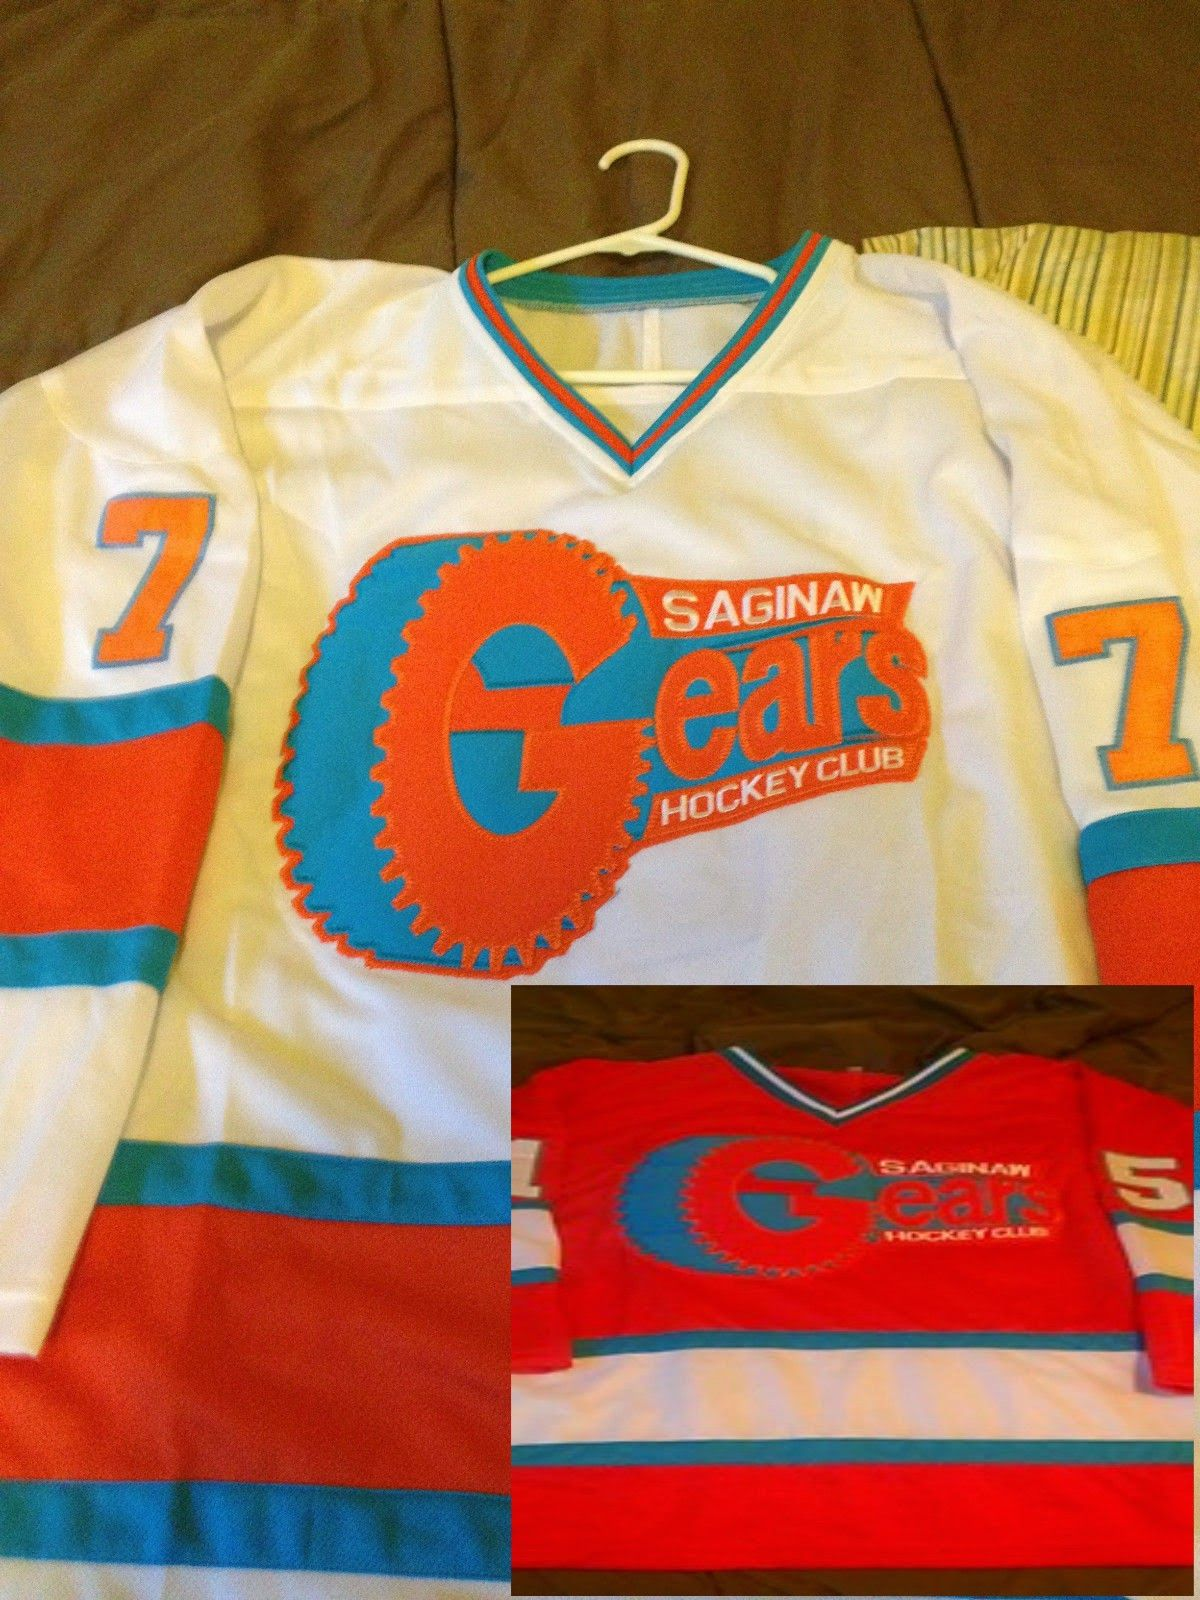 c84cf5597 saginaw gears jersey - Google Search